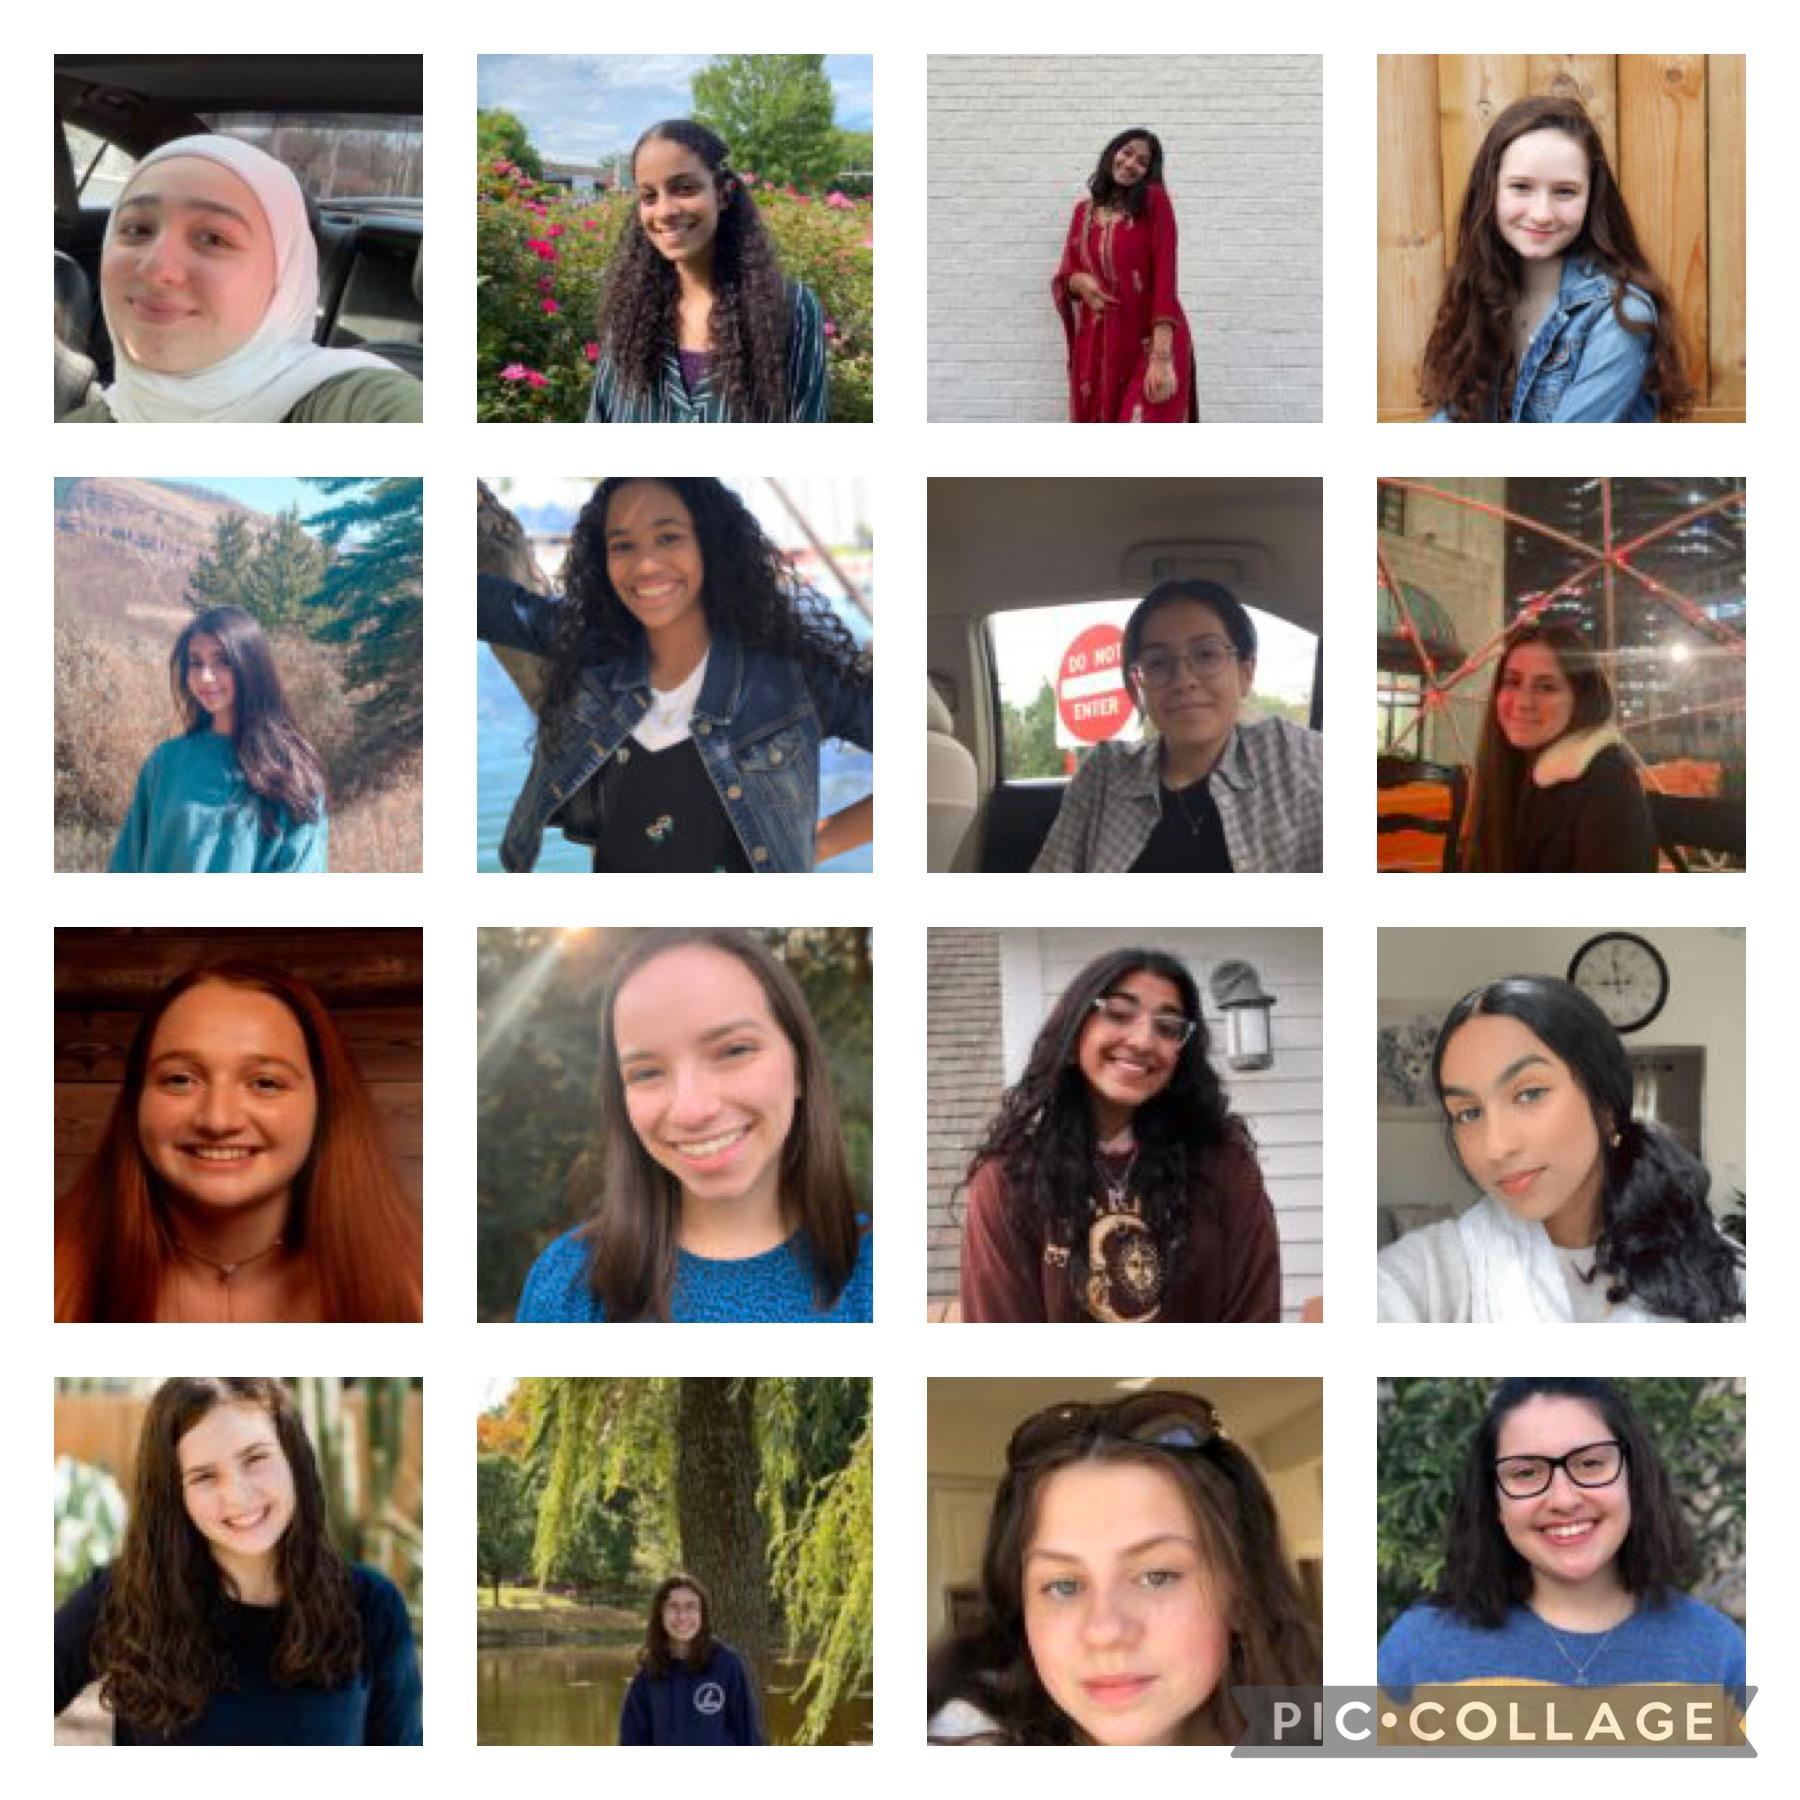 Collage of sixteen teen girl headshots